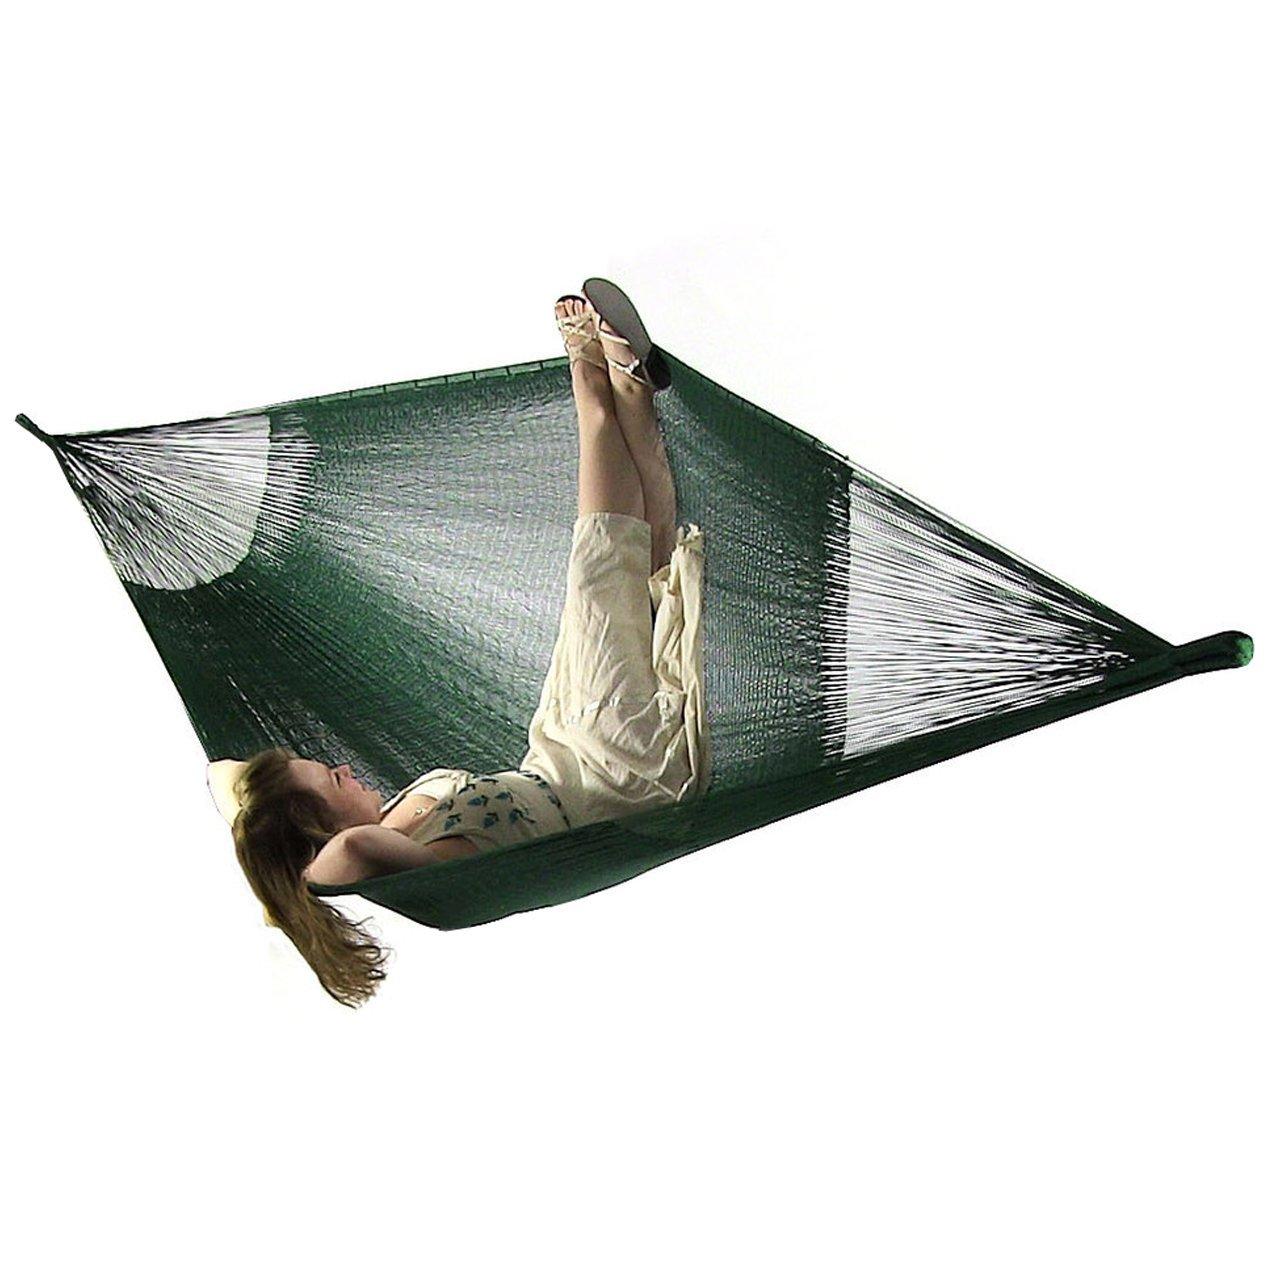 Sunnydaze Portable Mayan Hammock Hand-Woven, Family Size, 660 Pound Capacity, Green